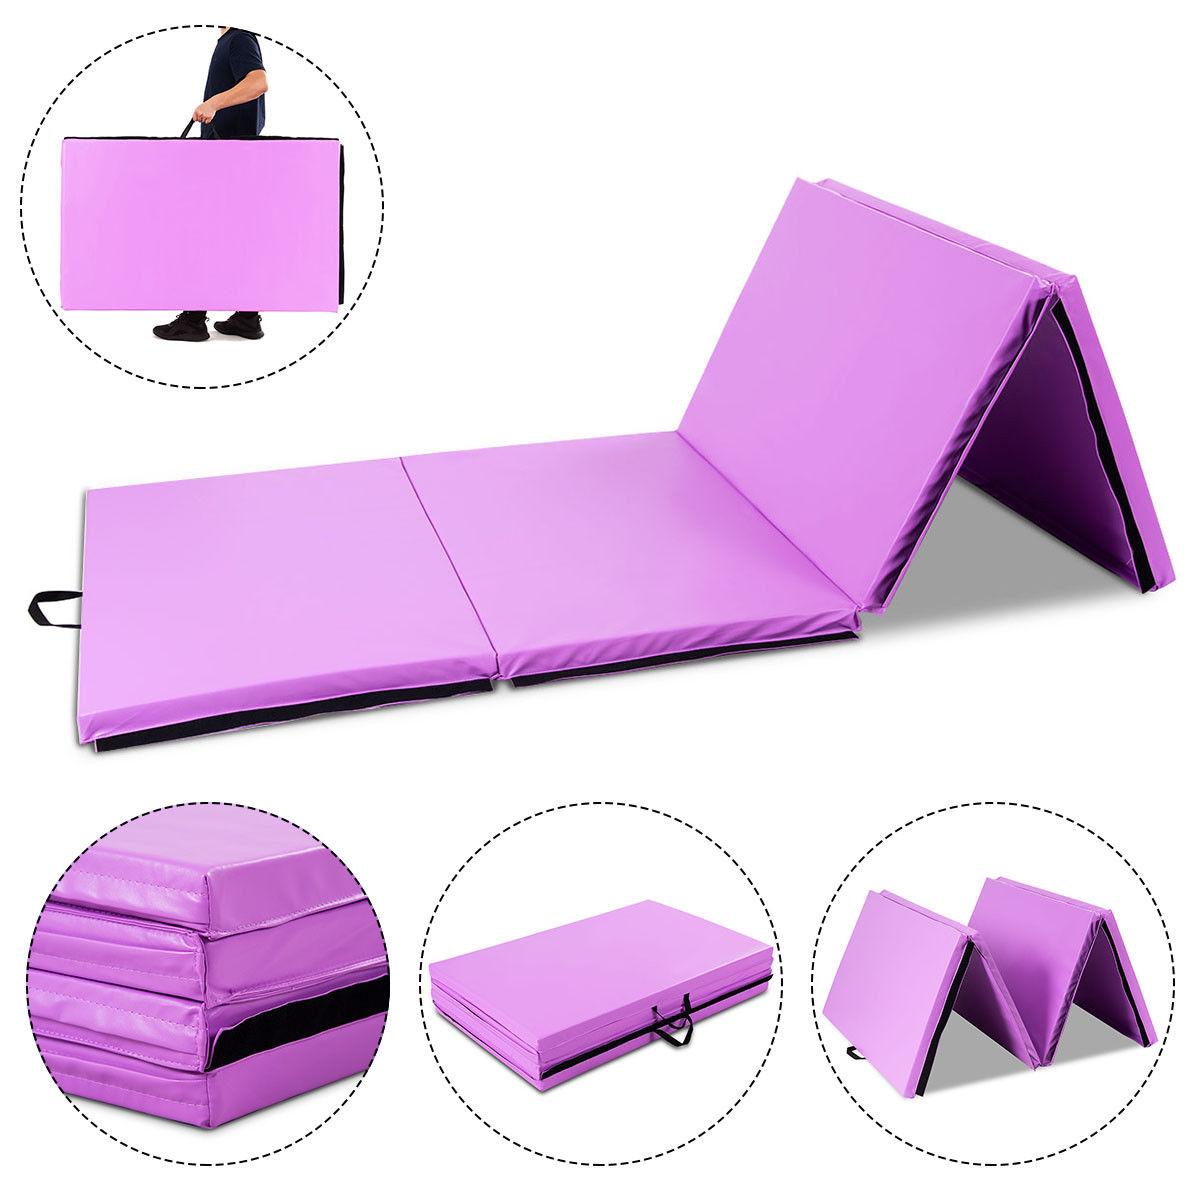 Gymax 4 X10 X2 Portable Gymnastic Mat Thick Folding Gym